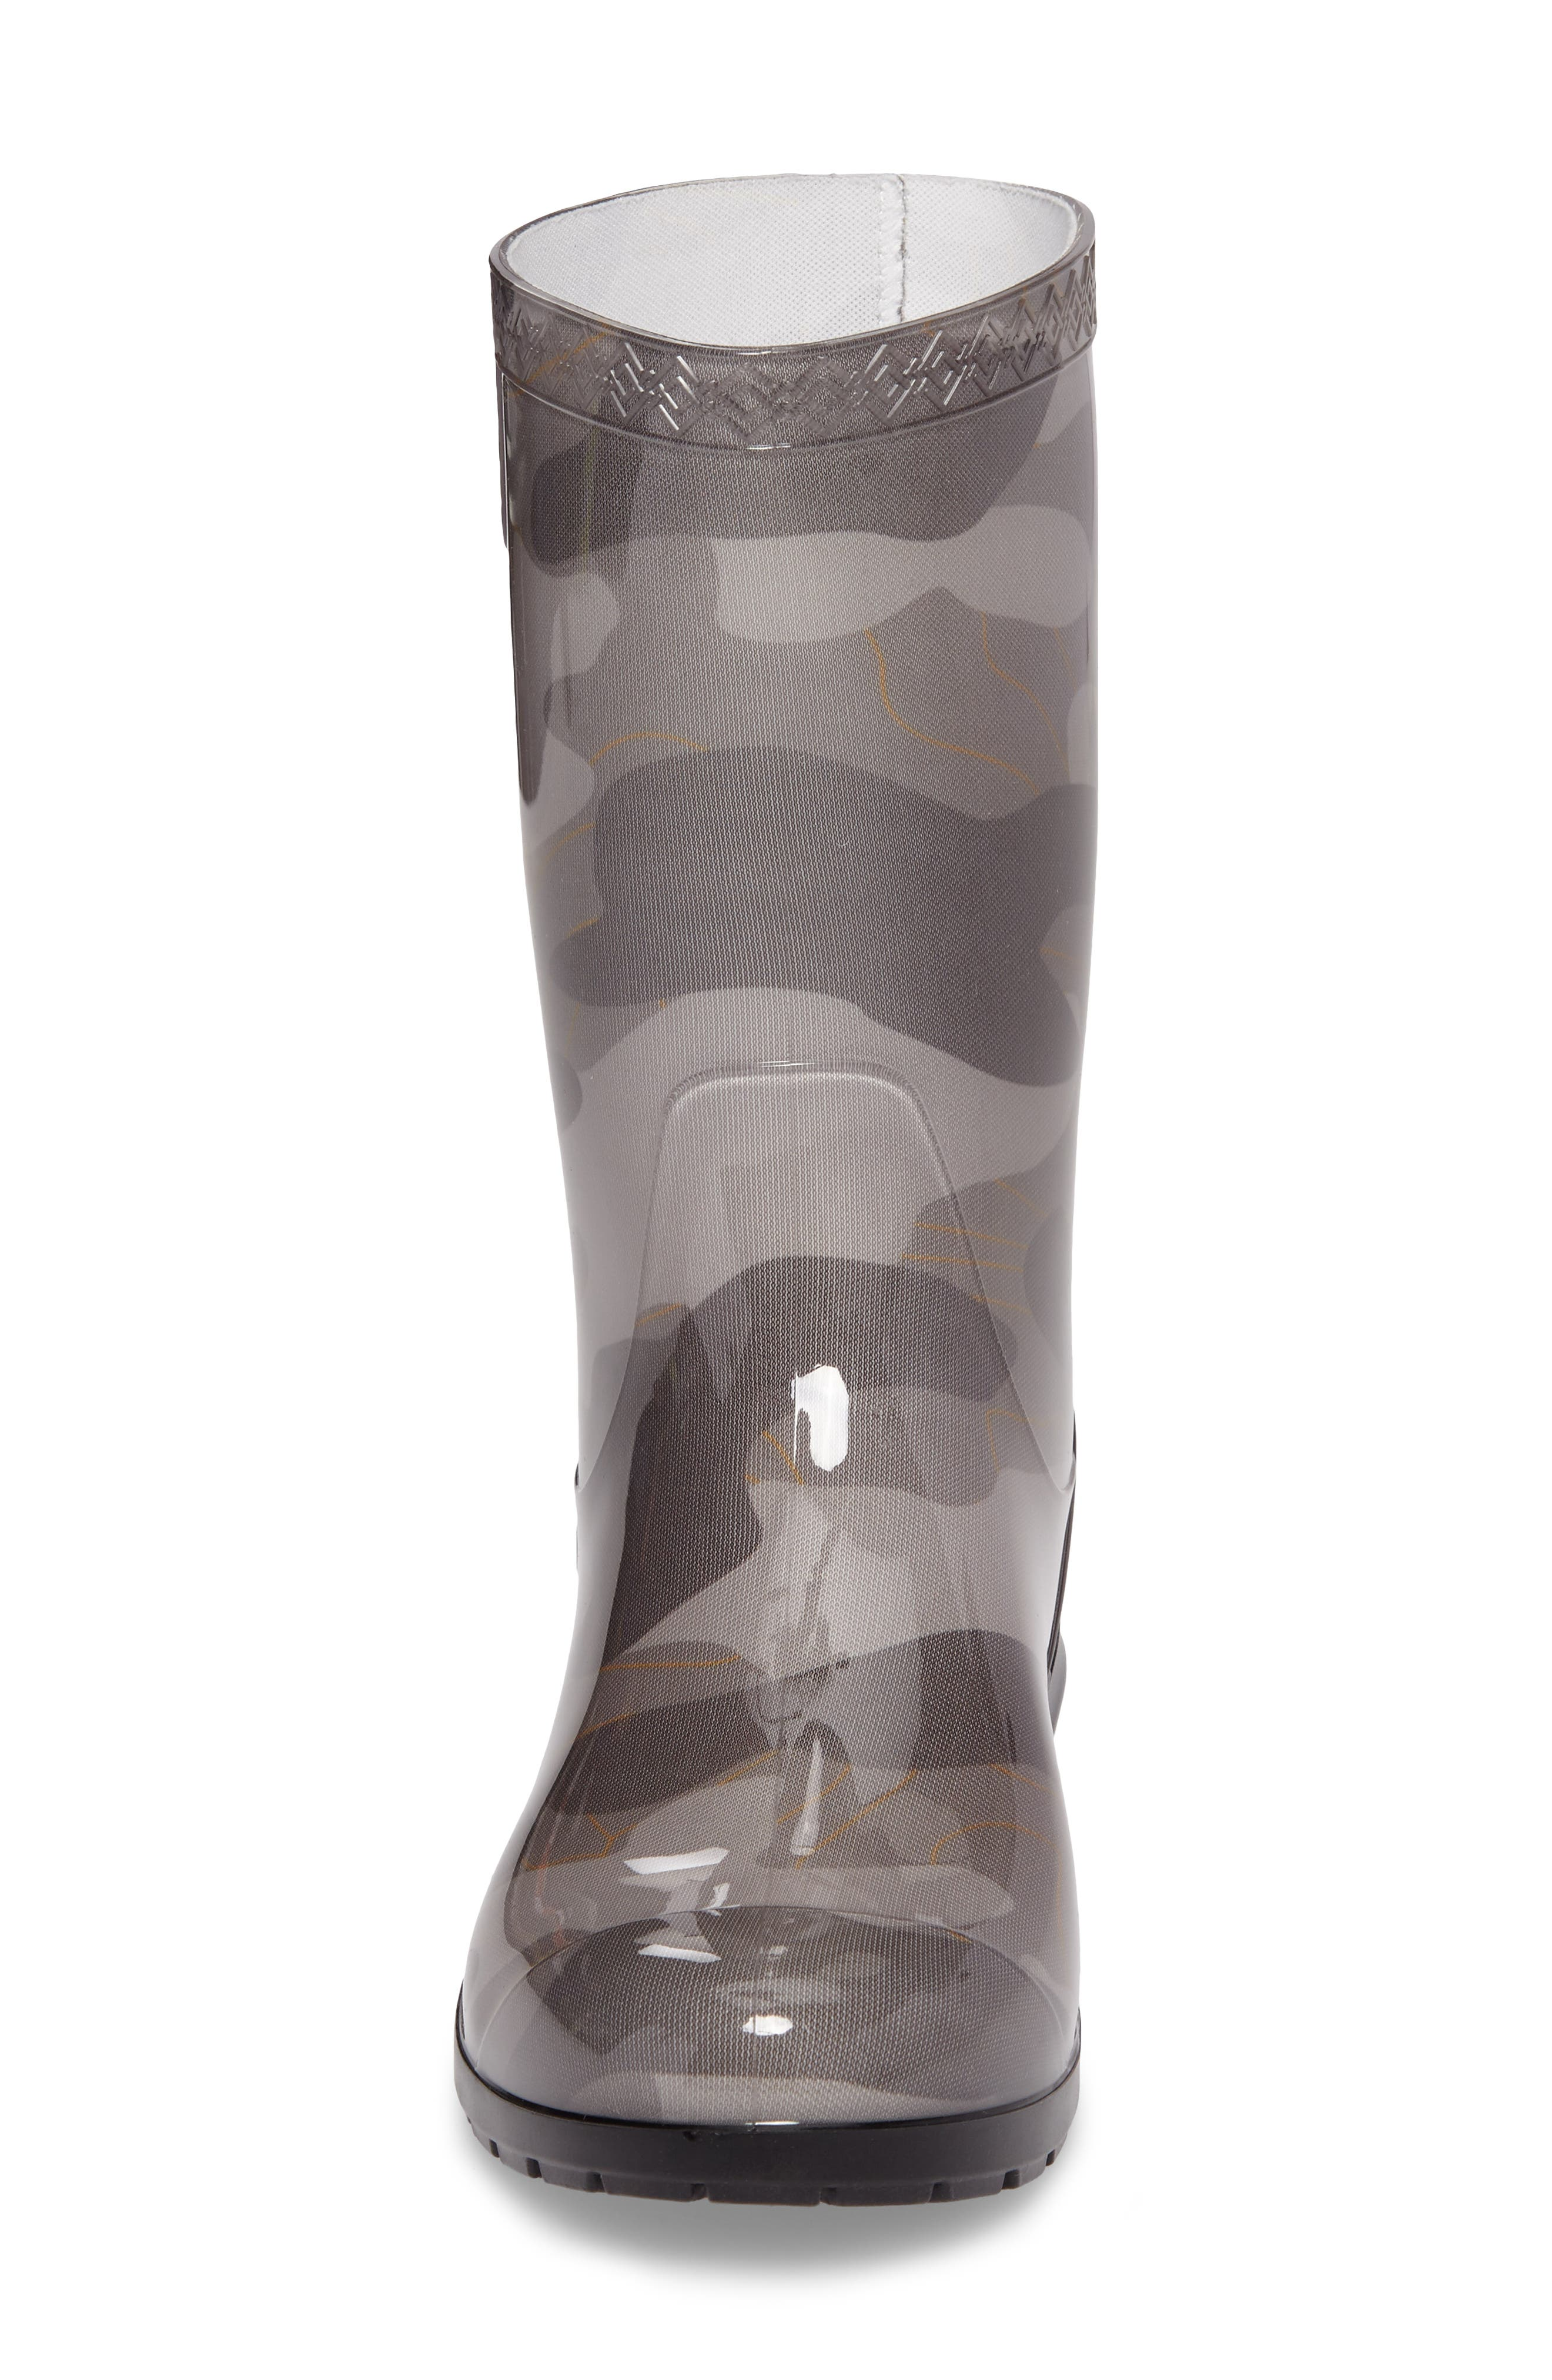 Rahjee Camo Waterproof Rain Boot,                             Alternate thumbnail 4, color,                             020